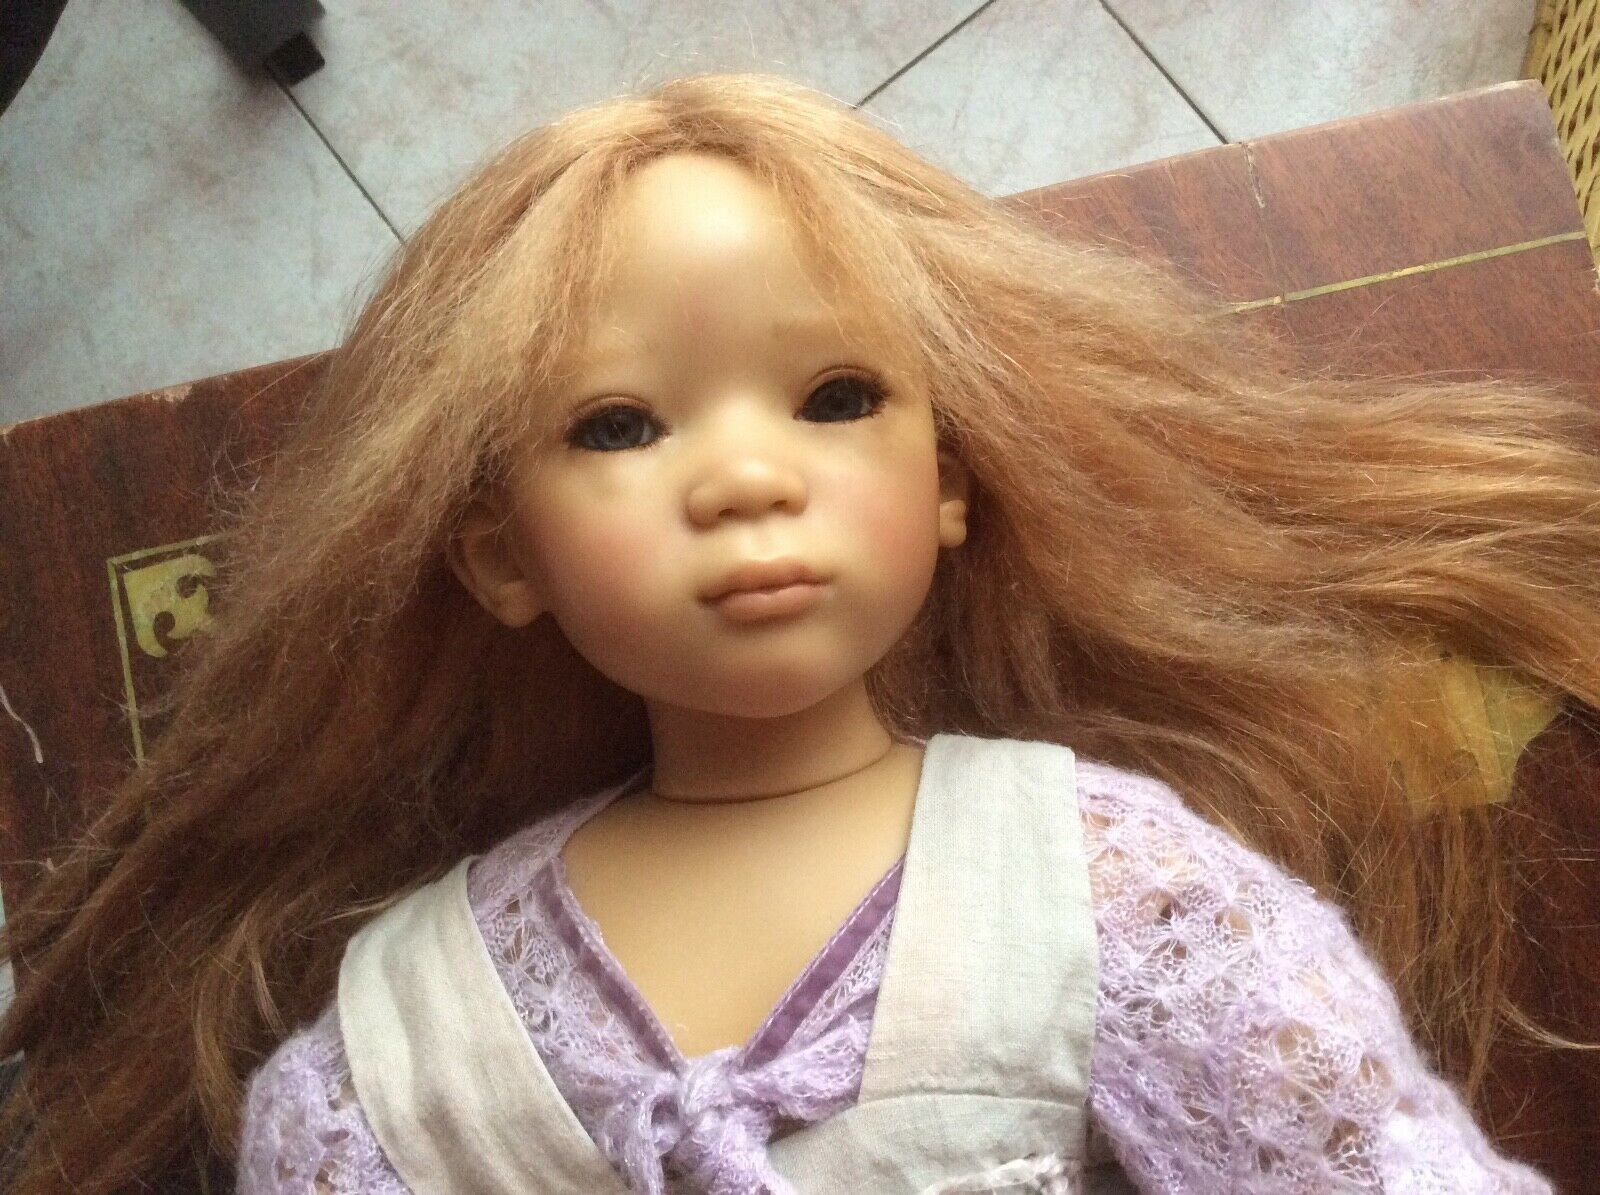 Bambola Annette Himstedt Cinderella BELLISSIMA      ...vintage.bambola  prezzo basso